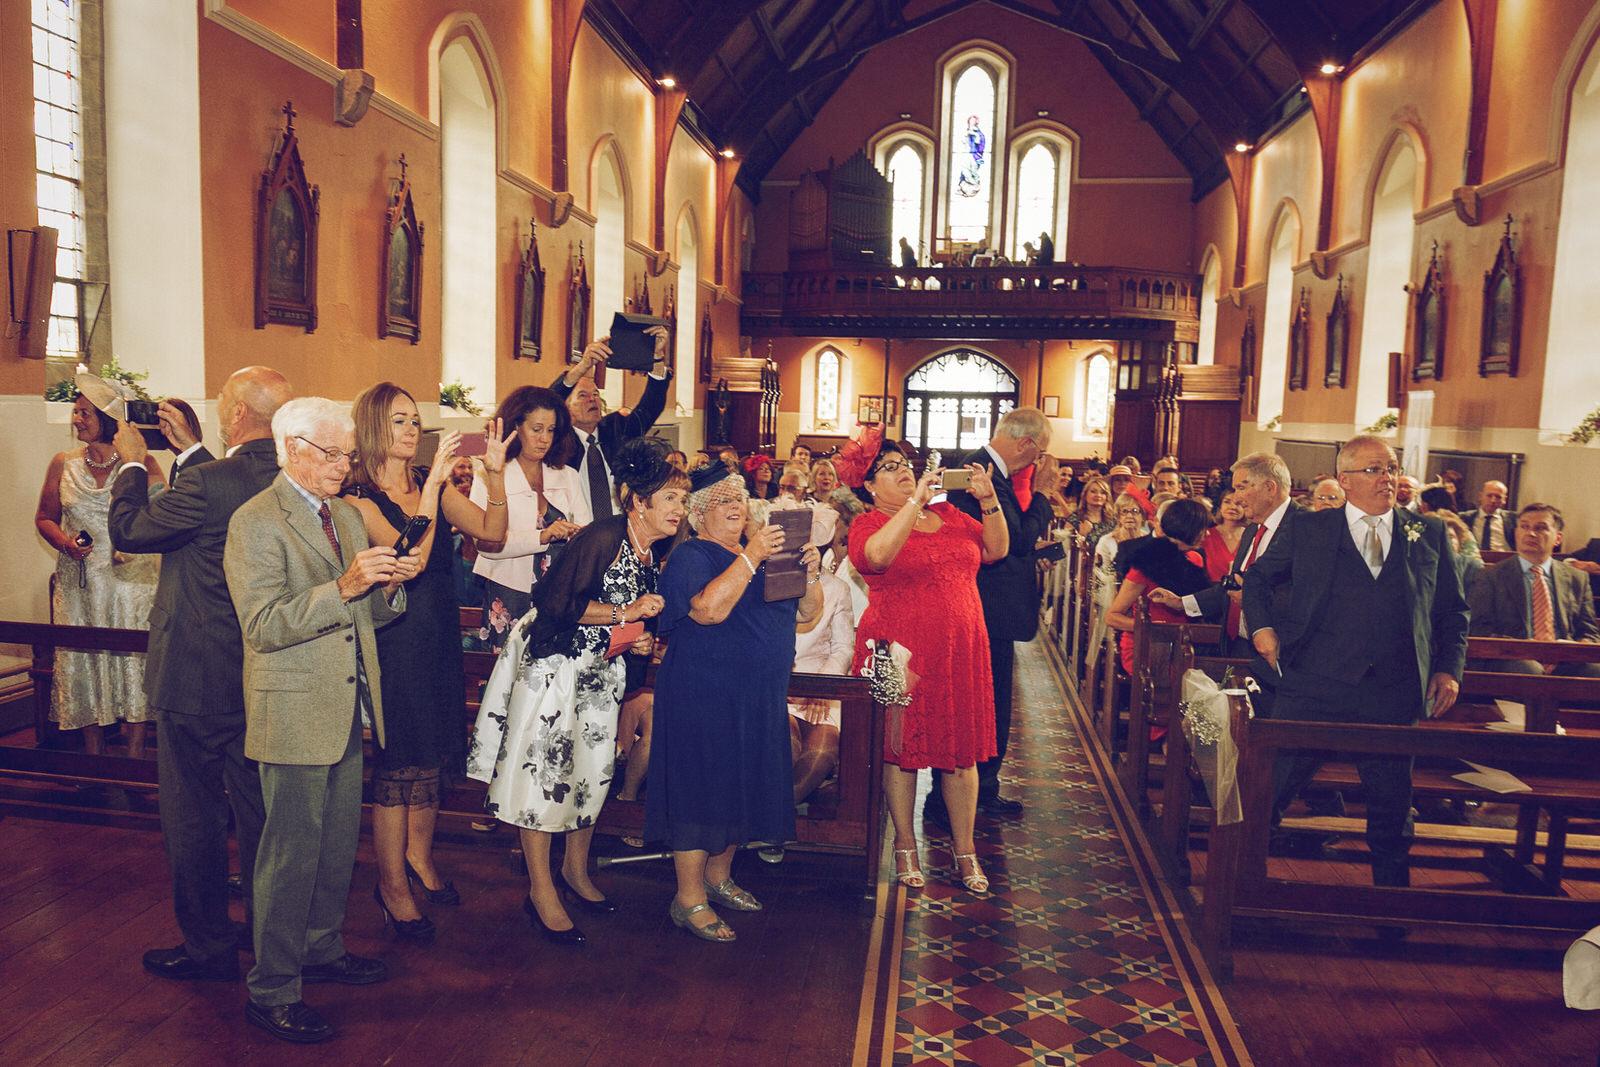 Brooklodge-wicklow-wedding-photographer_048.jpg